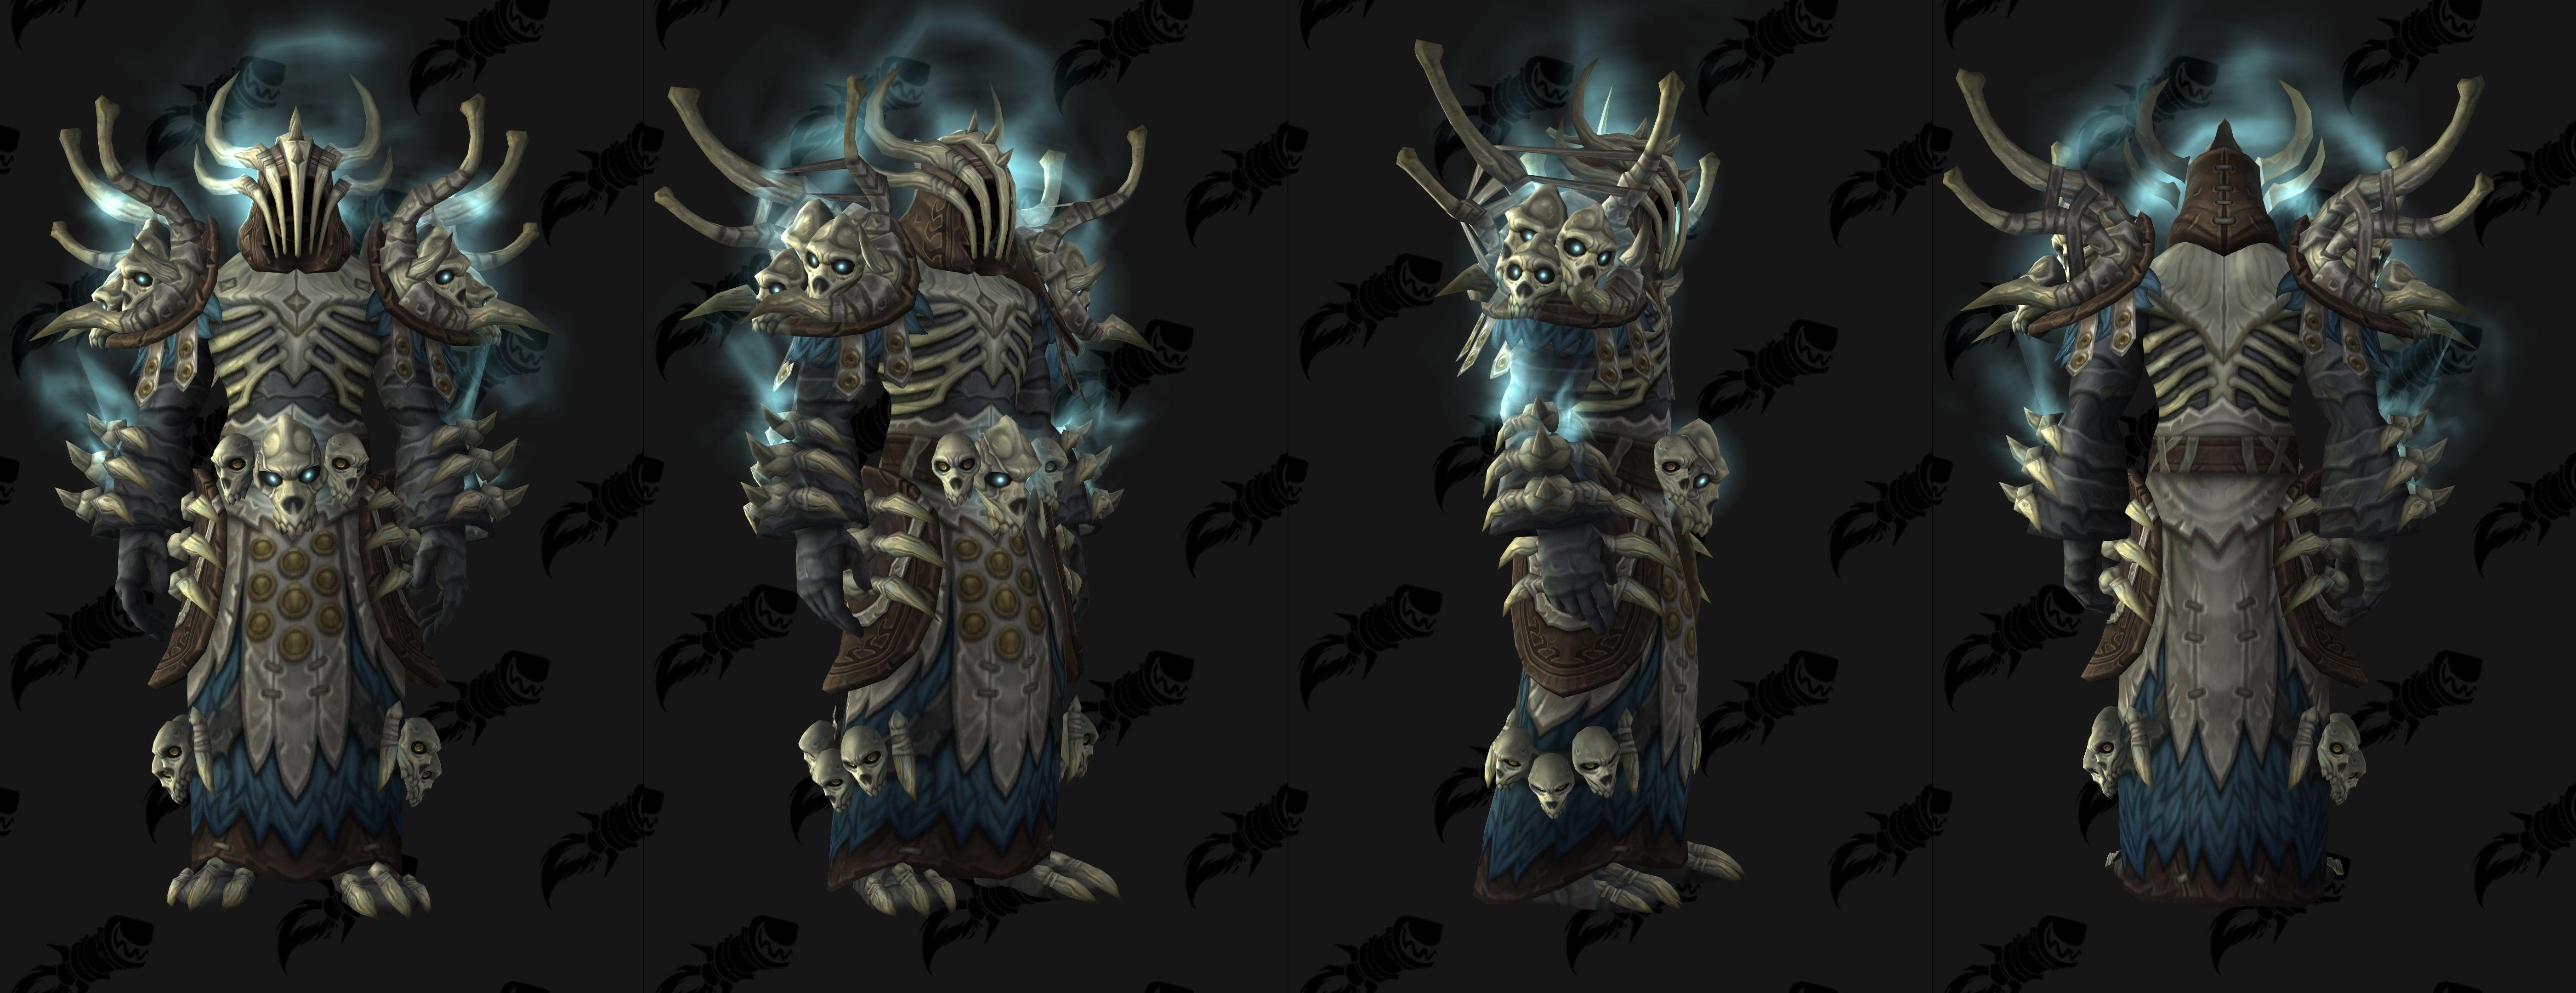 Battle of Dazar'alor Raid Gear and Azerite Armor Loot Guide